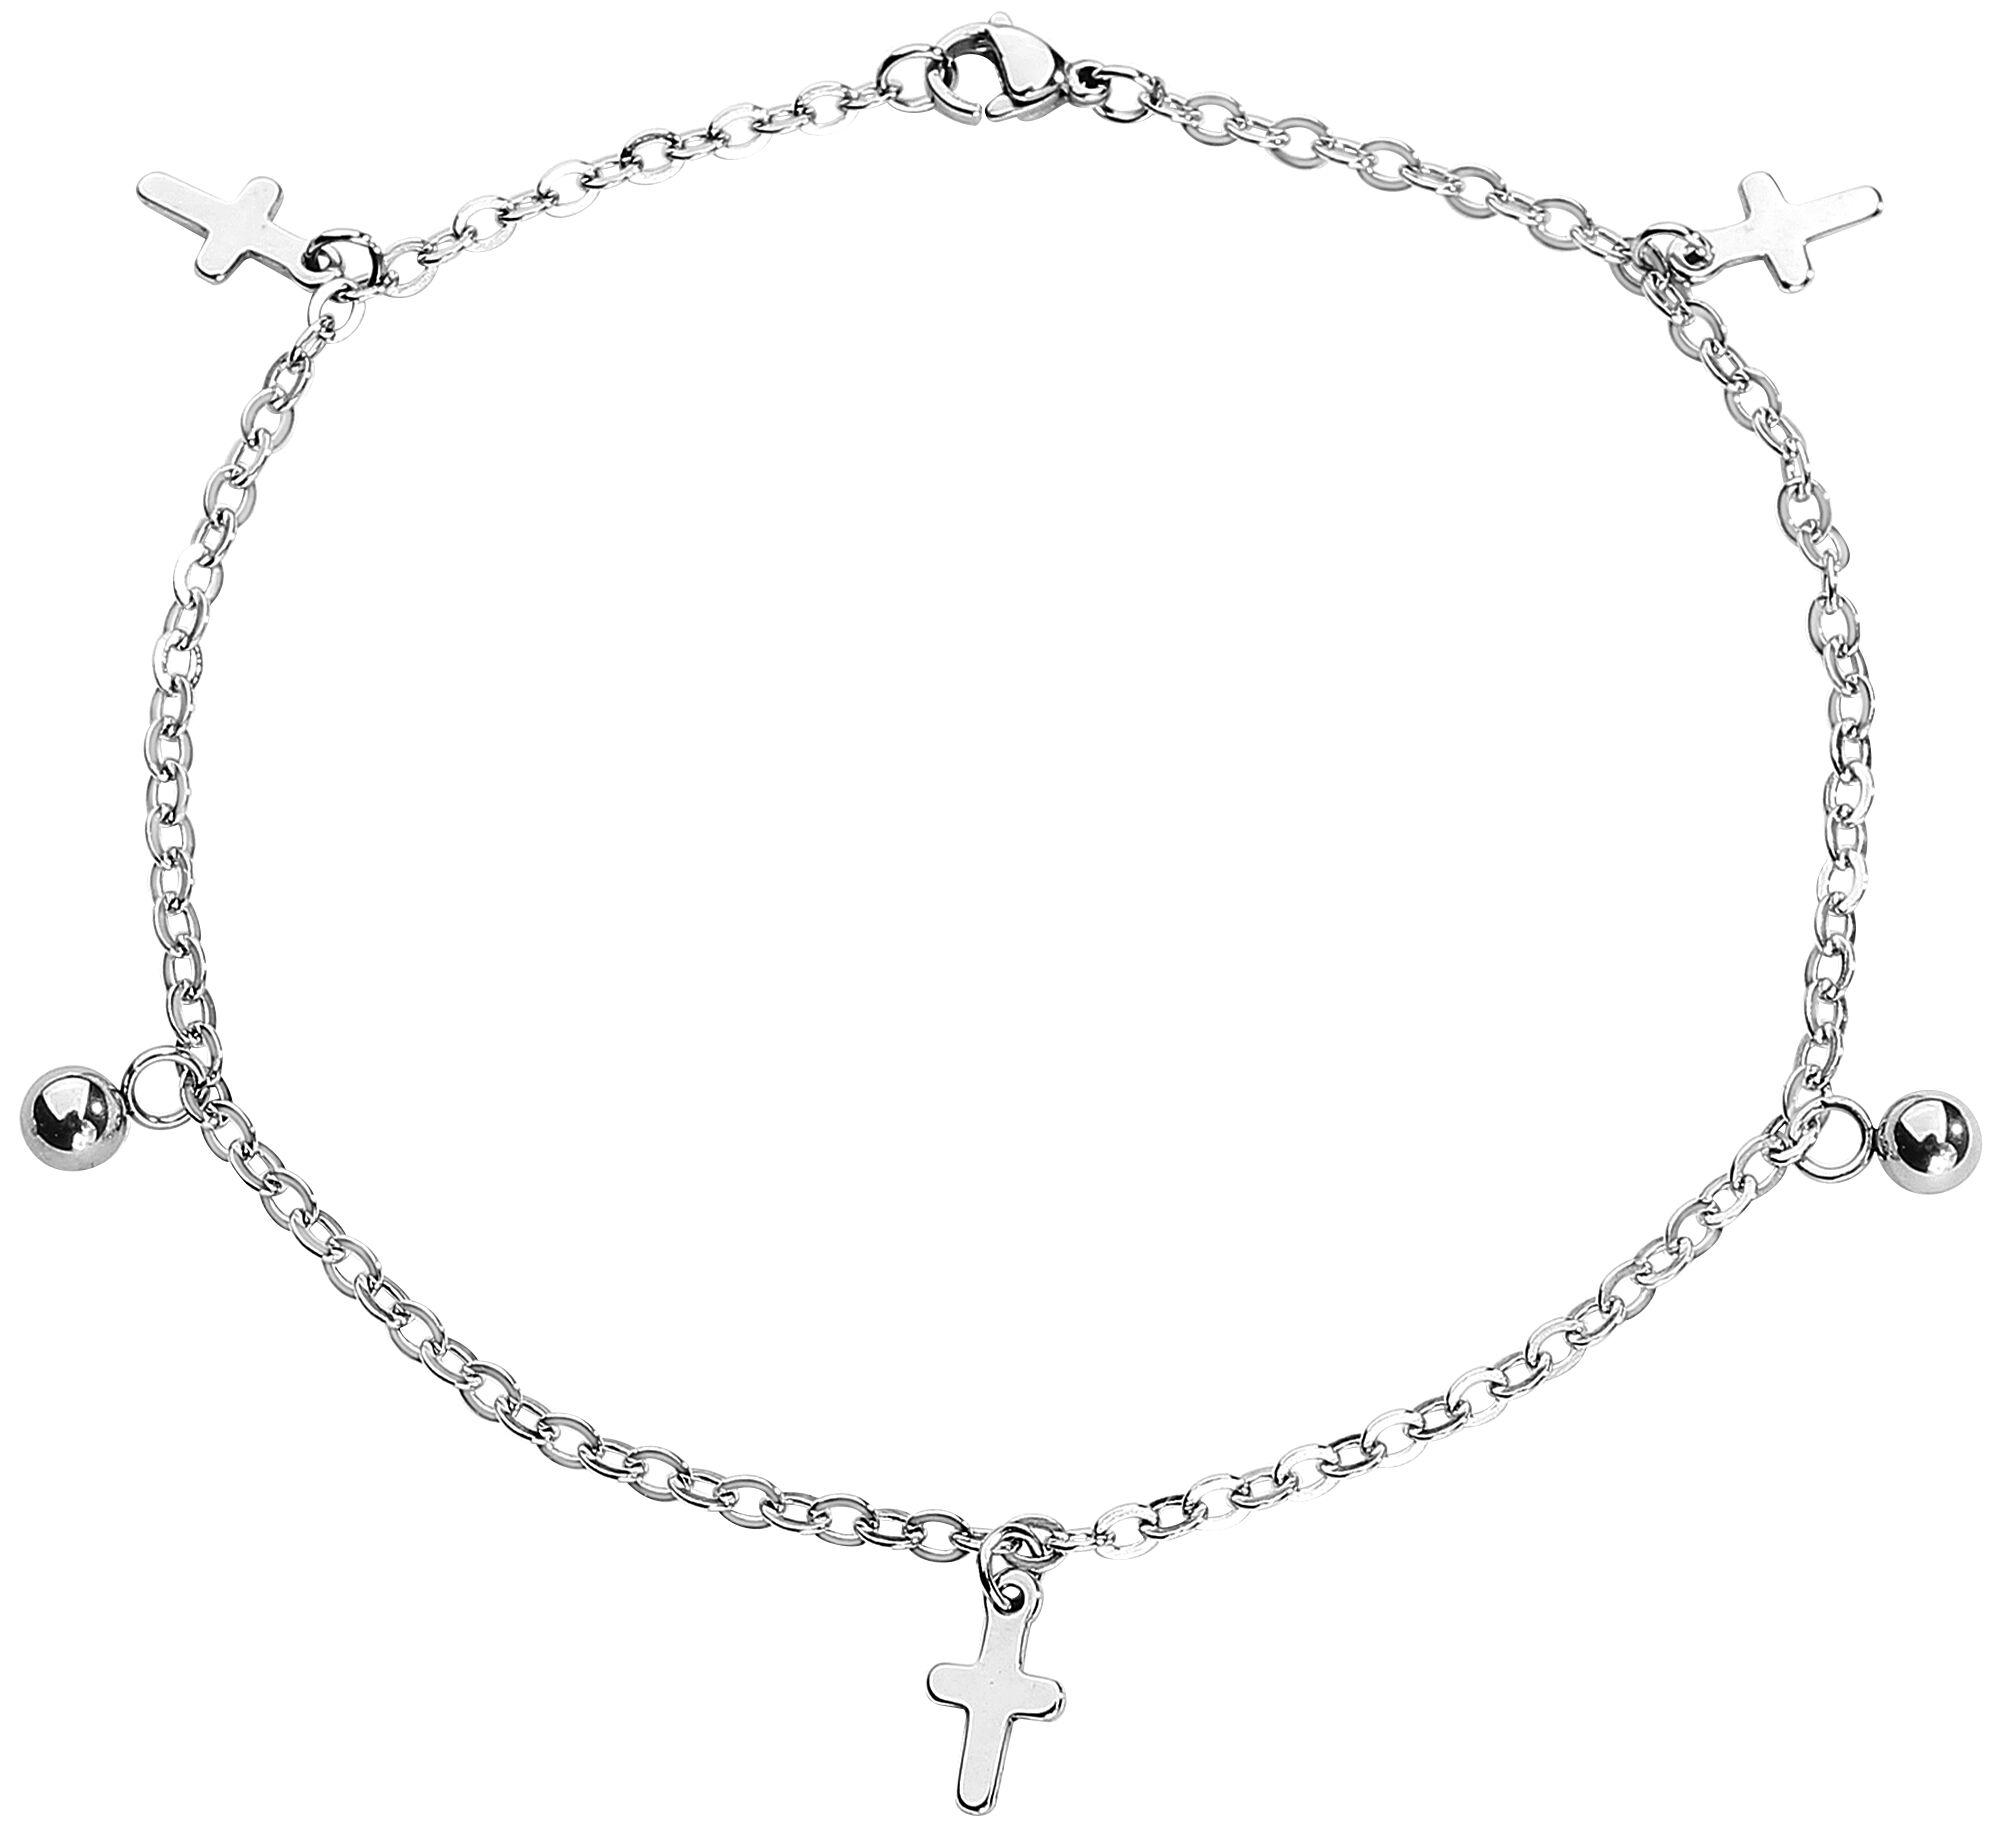 Basics - Biżuteria na stopę - Łańcuszek na kostkę Crosses Łańcuszek na kostkę standard - 324159